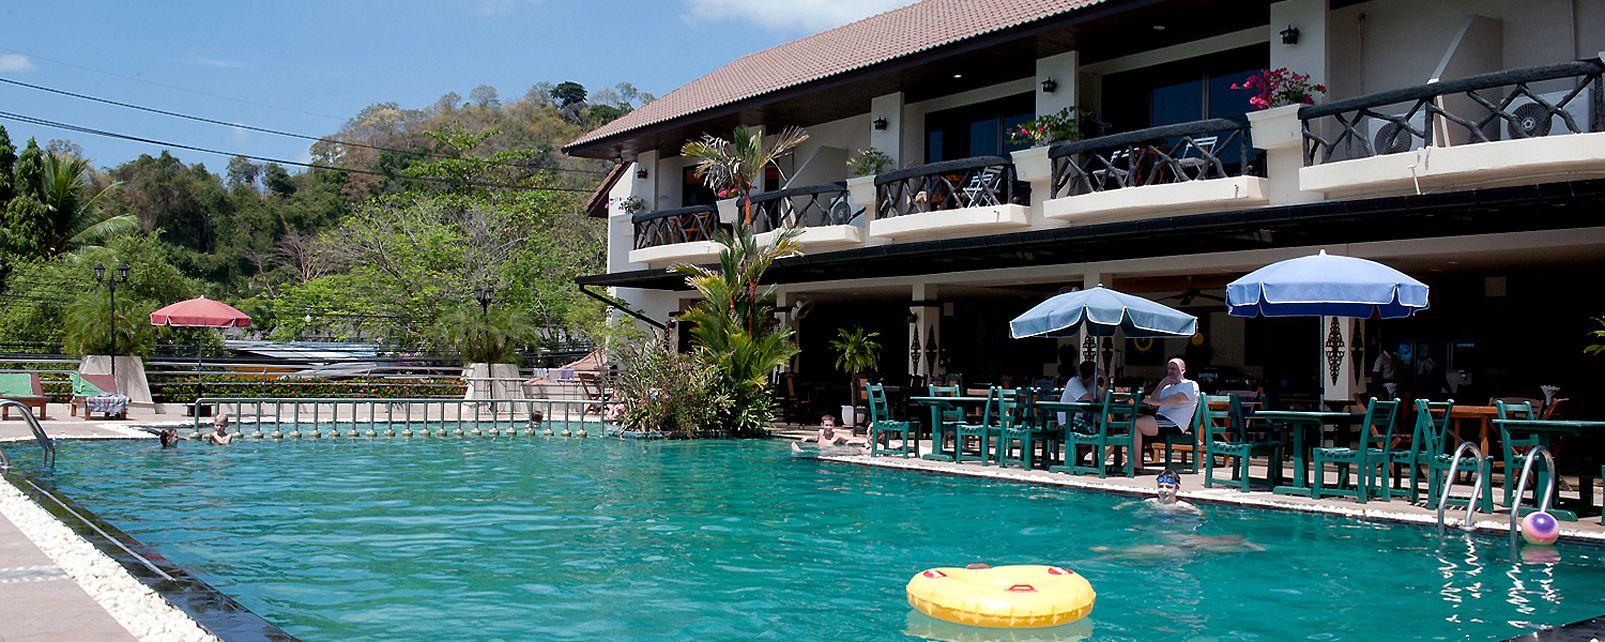 Hôtel Best Western Ban Ao Nang Resort Krabi